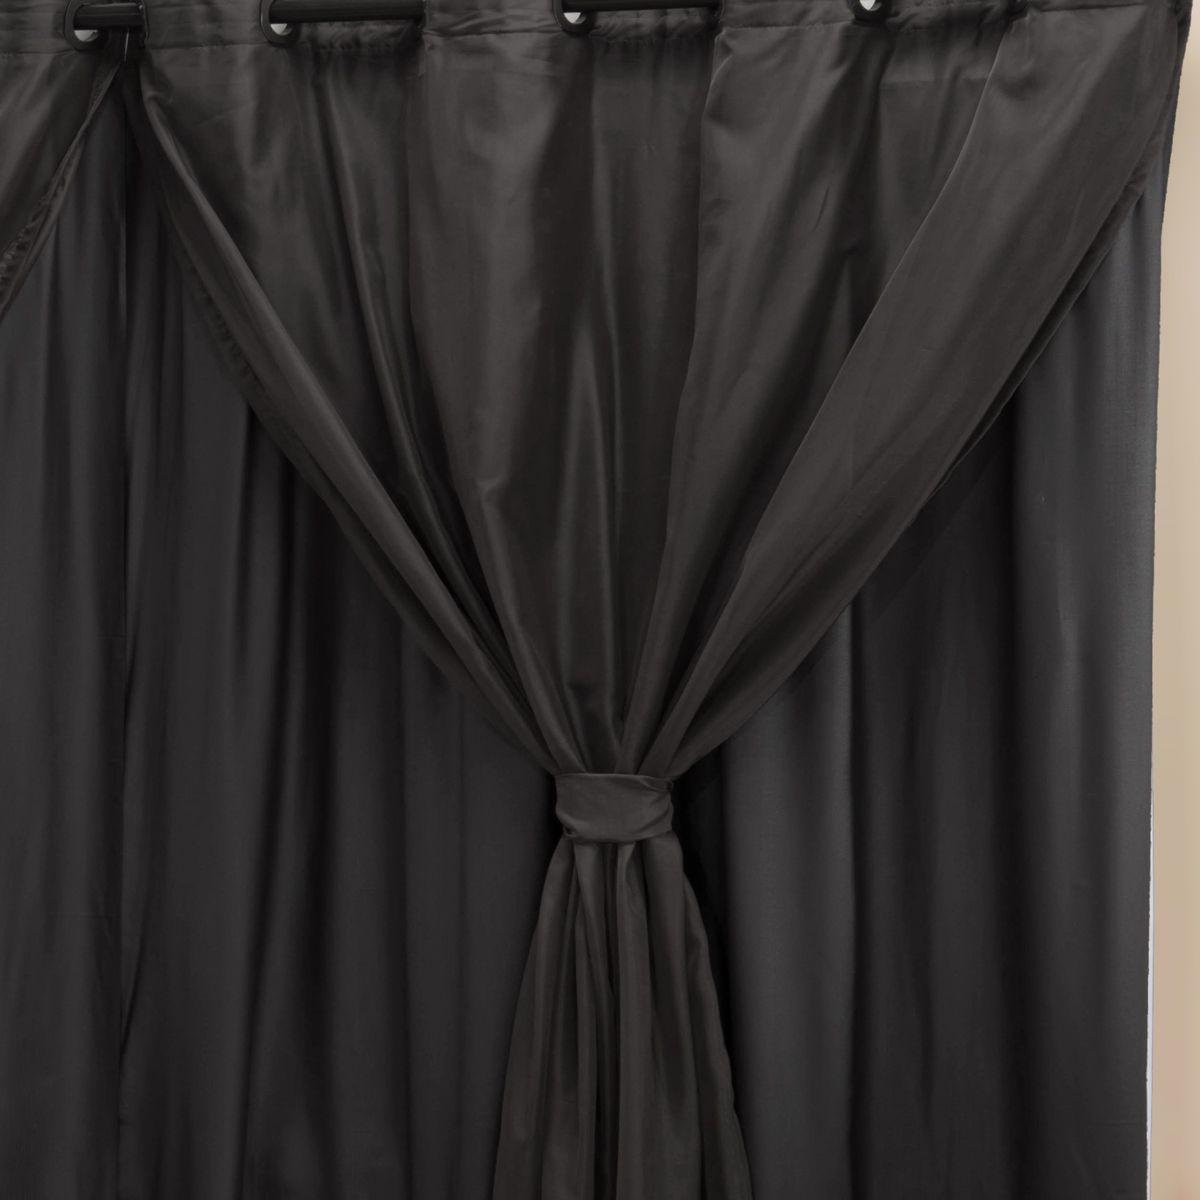 Cortina Blackout PVC c/ Voil Preto Corta Luz 2,80m X 1,80m